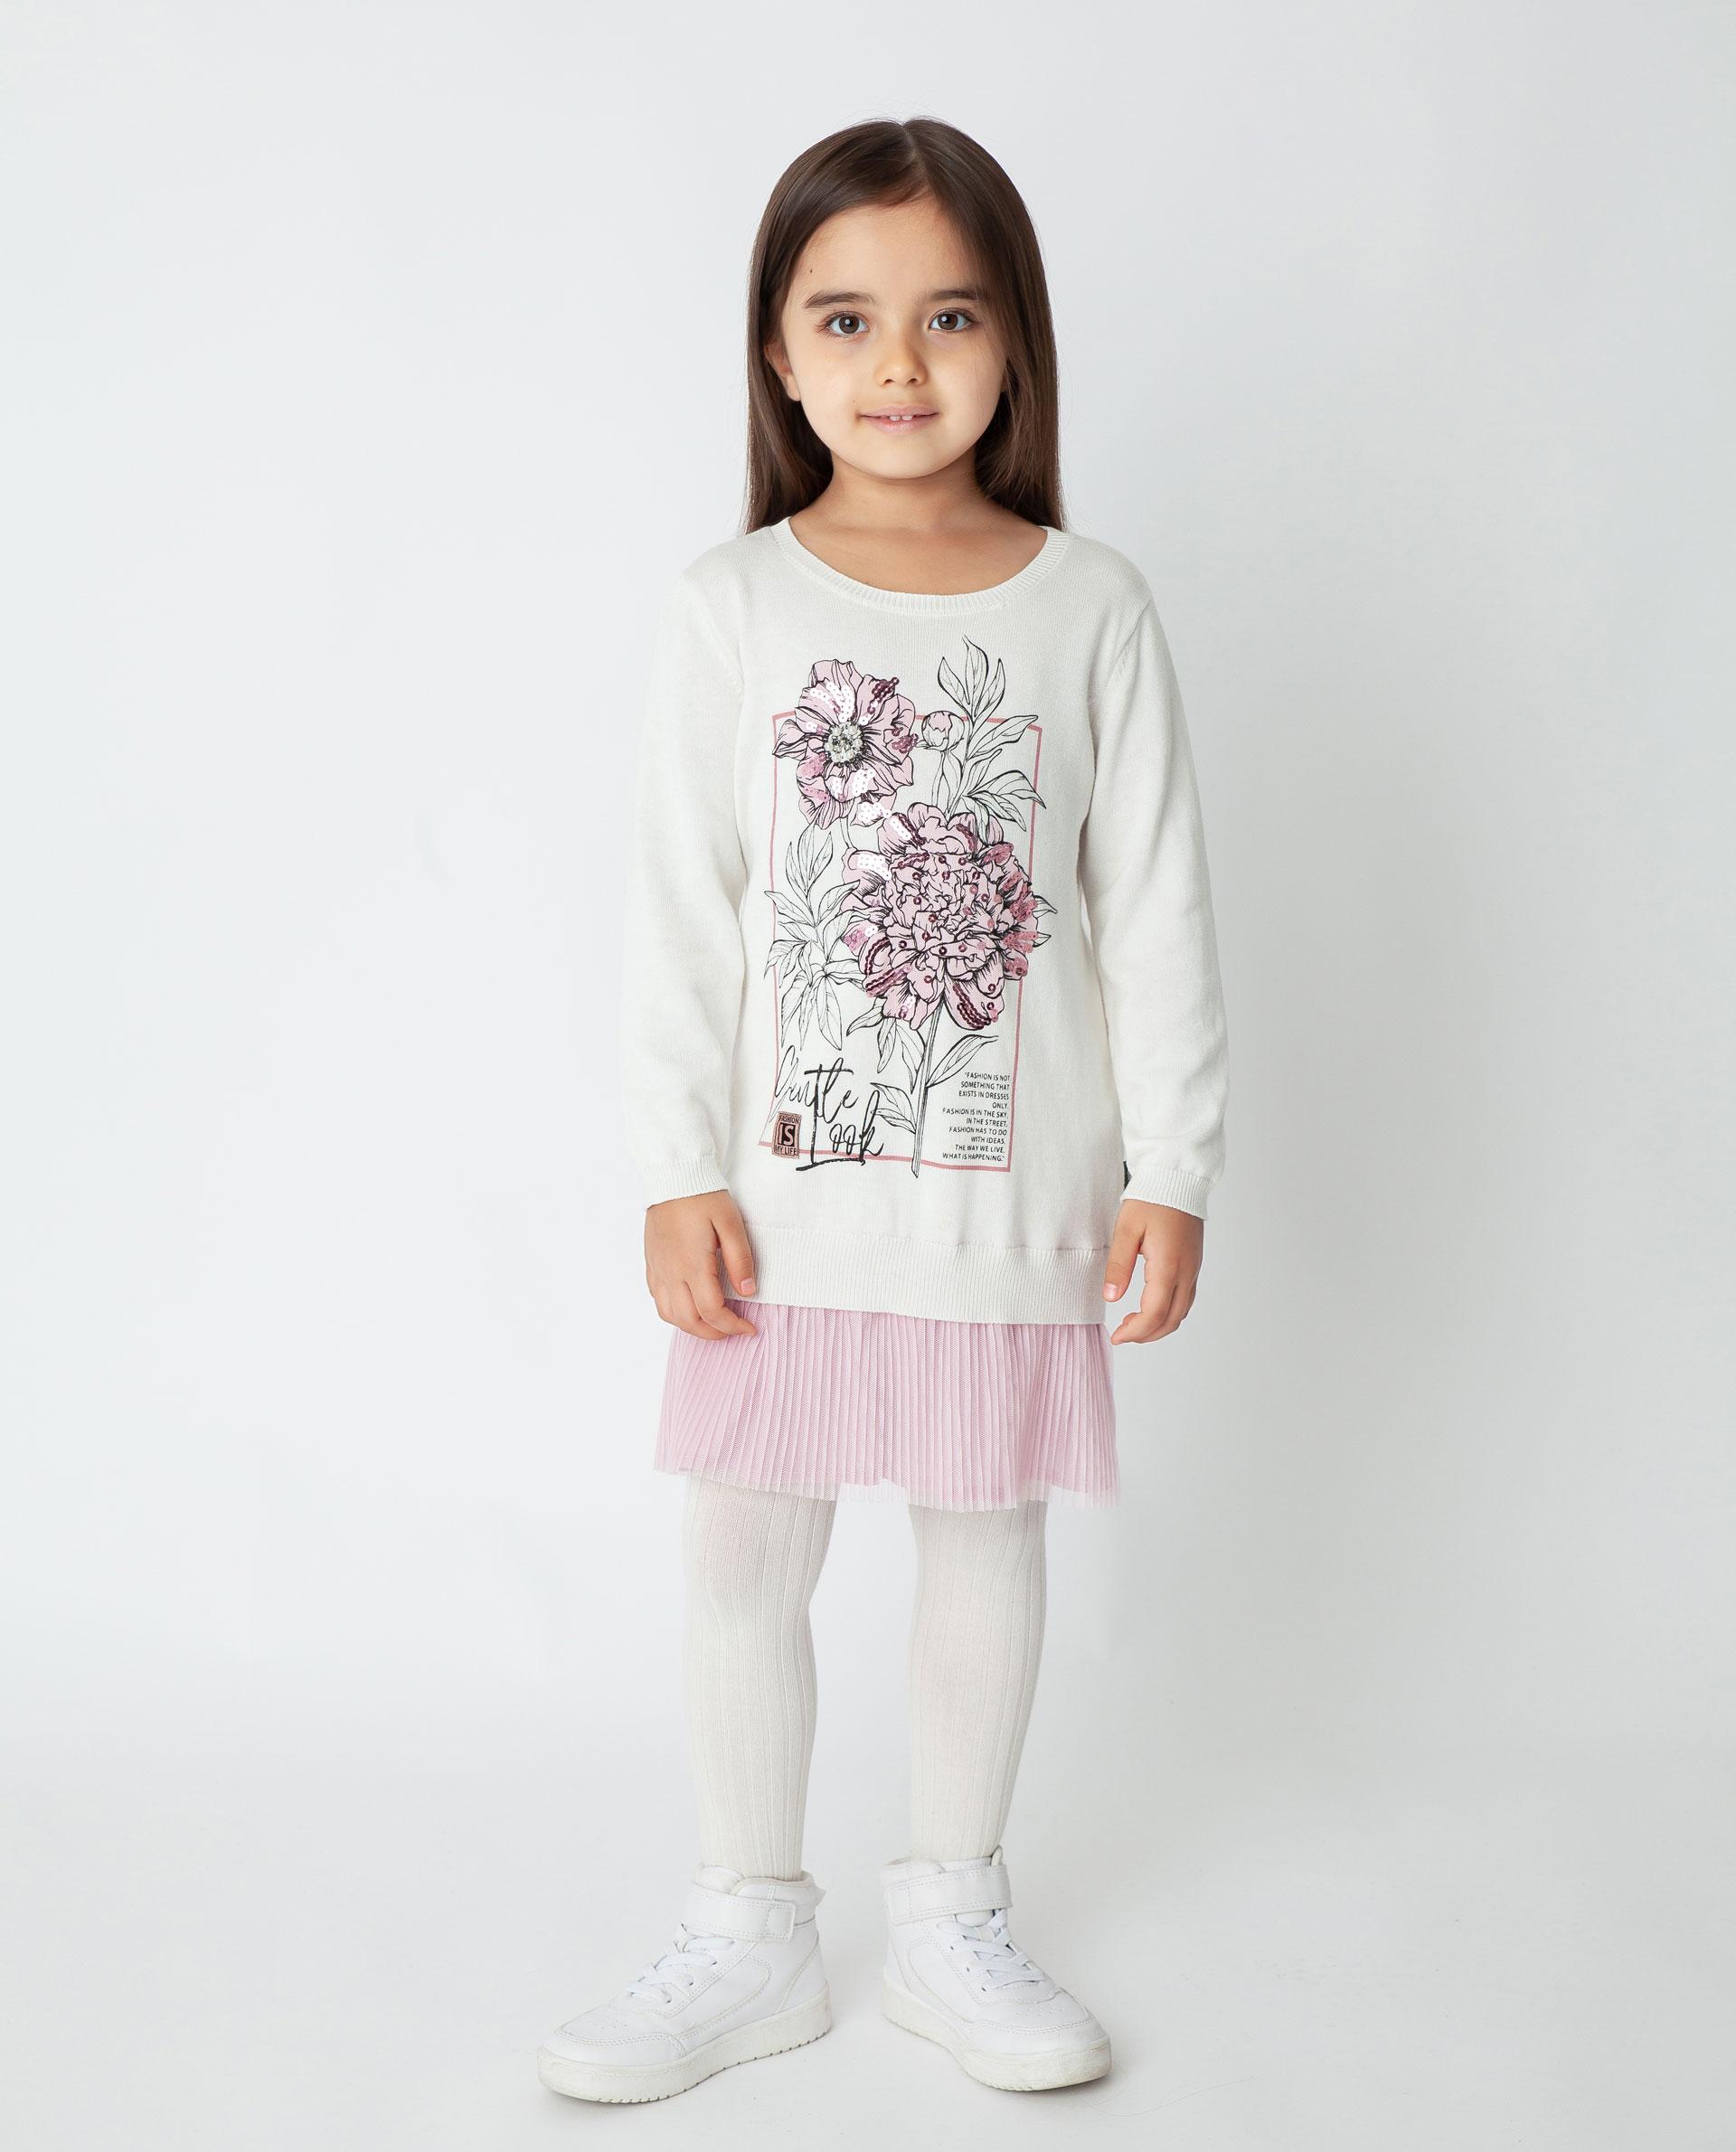 Купить 22001GMC3601, Белое платье Gulliver, белый, 116, Вискоза, Женский, Демисезон, ОСЕНЬ/ЗИМА 2020-2021 (shop: GulliverMarket Gulliver Market)